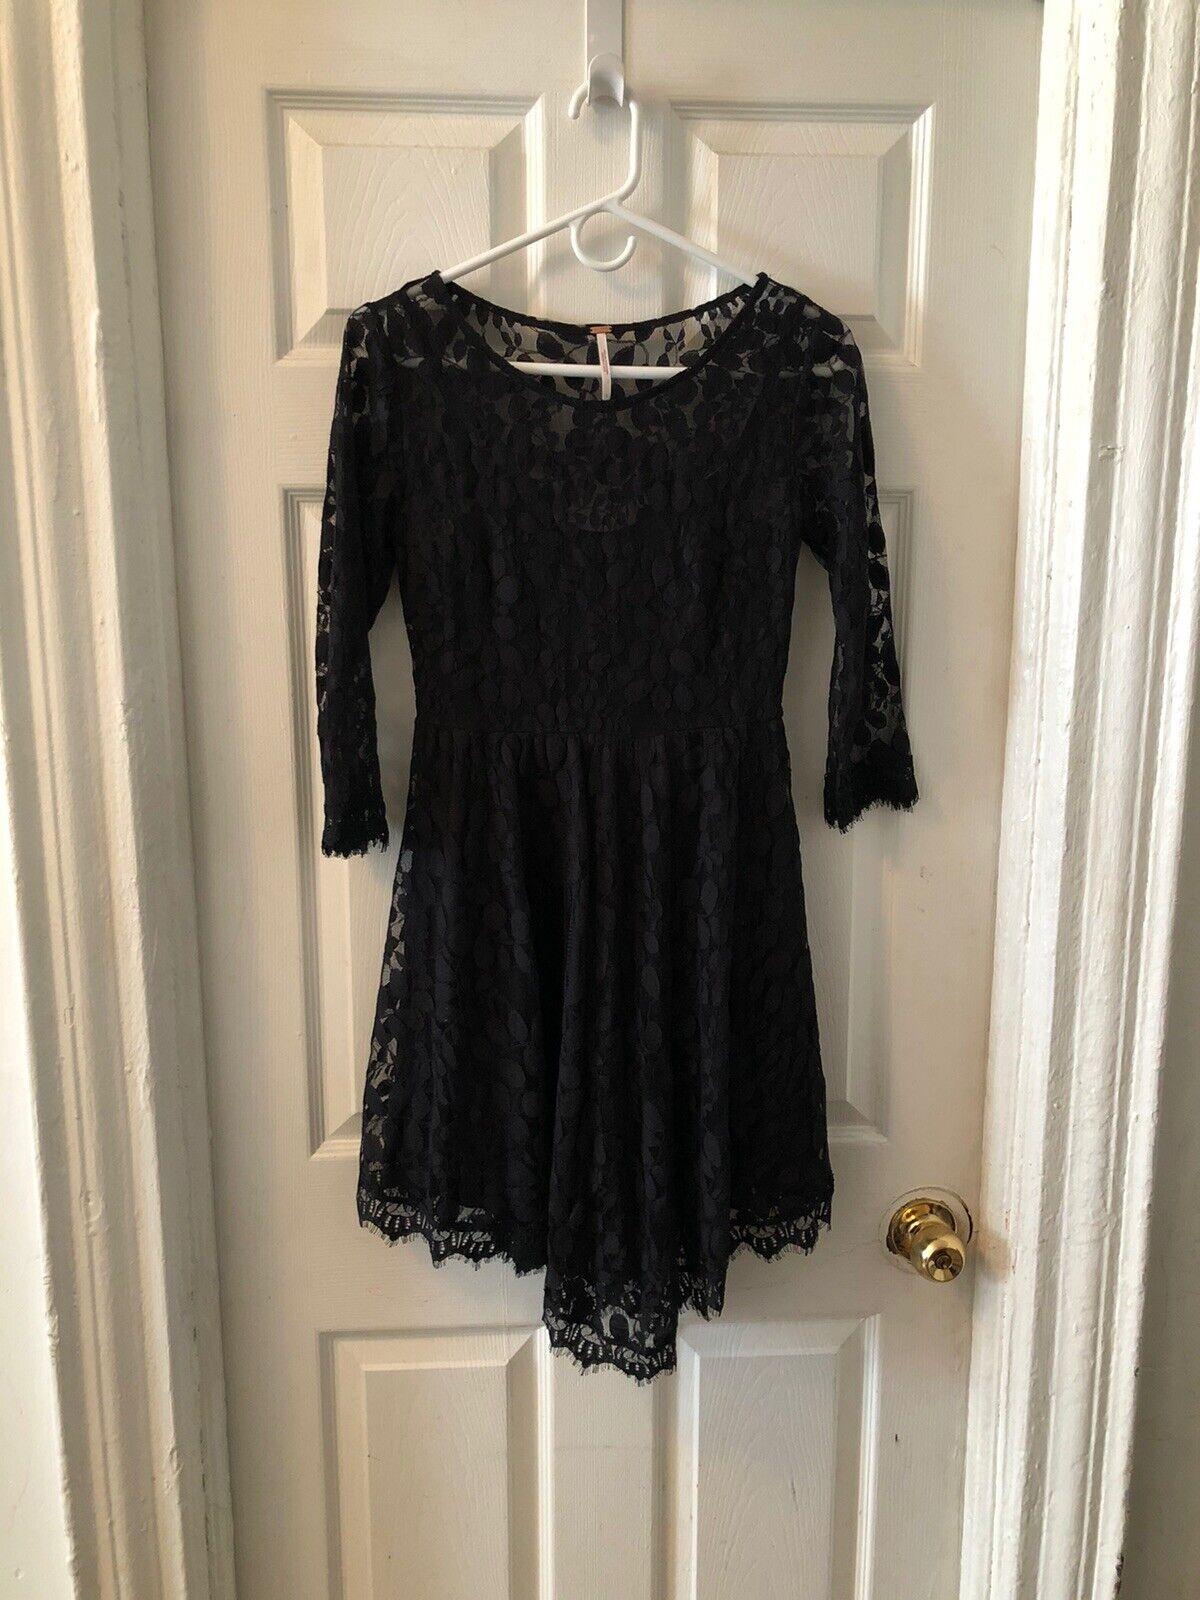 Free People Black Dress - image 3